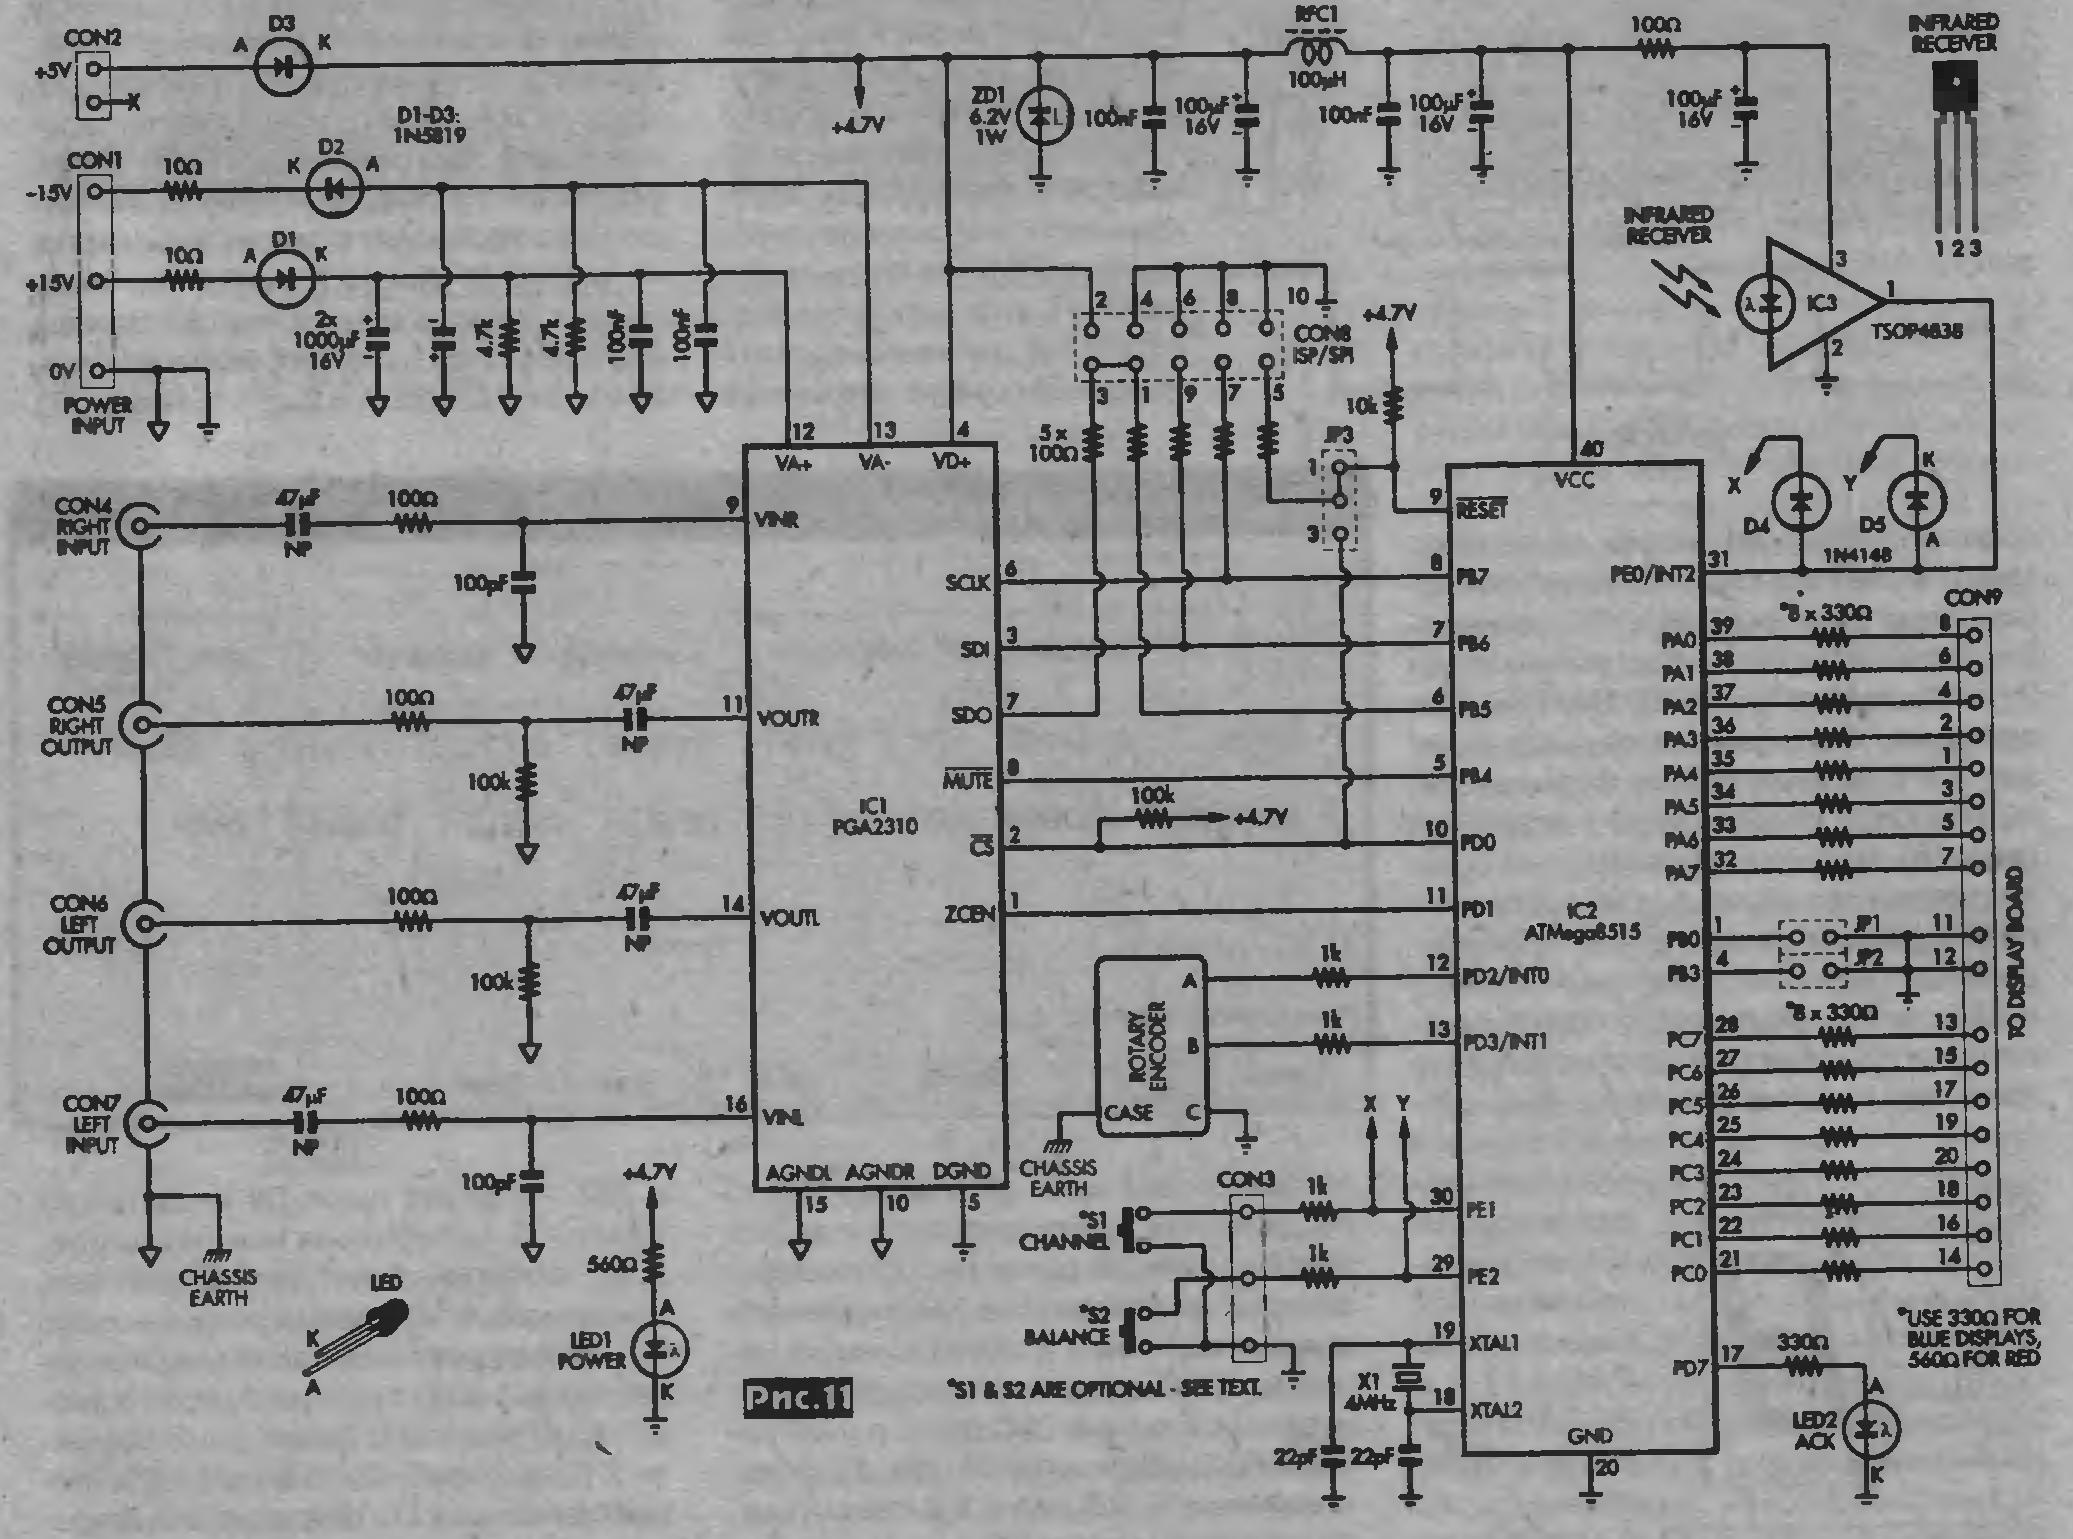 регулятор громкости звука схема 12 в